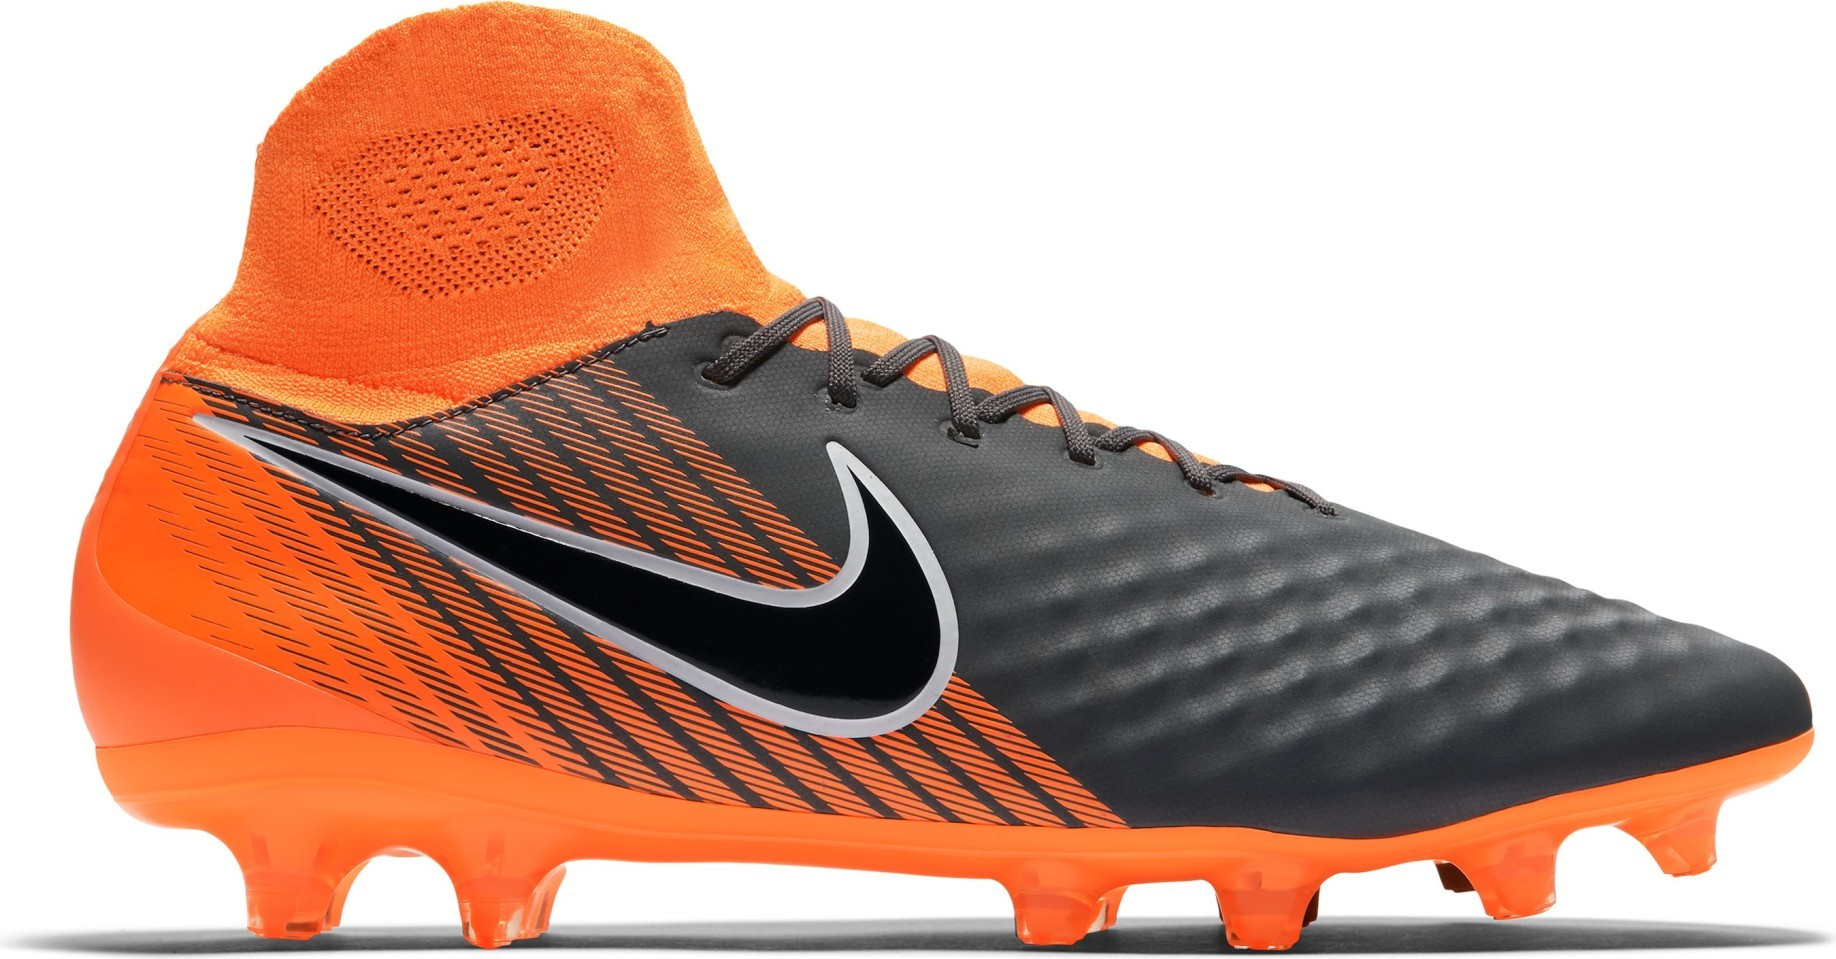 ed82cb482 Football boots Nike Magista Obra II Pro DF FG Fast AF Pack colore Grey  Orange - Nike - SportIT.com